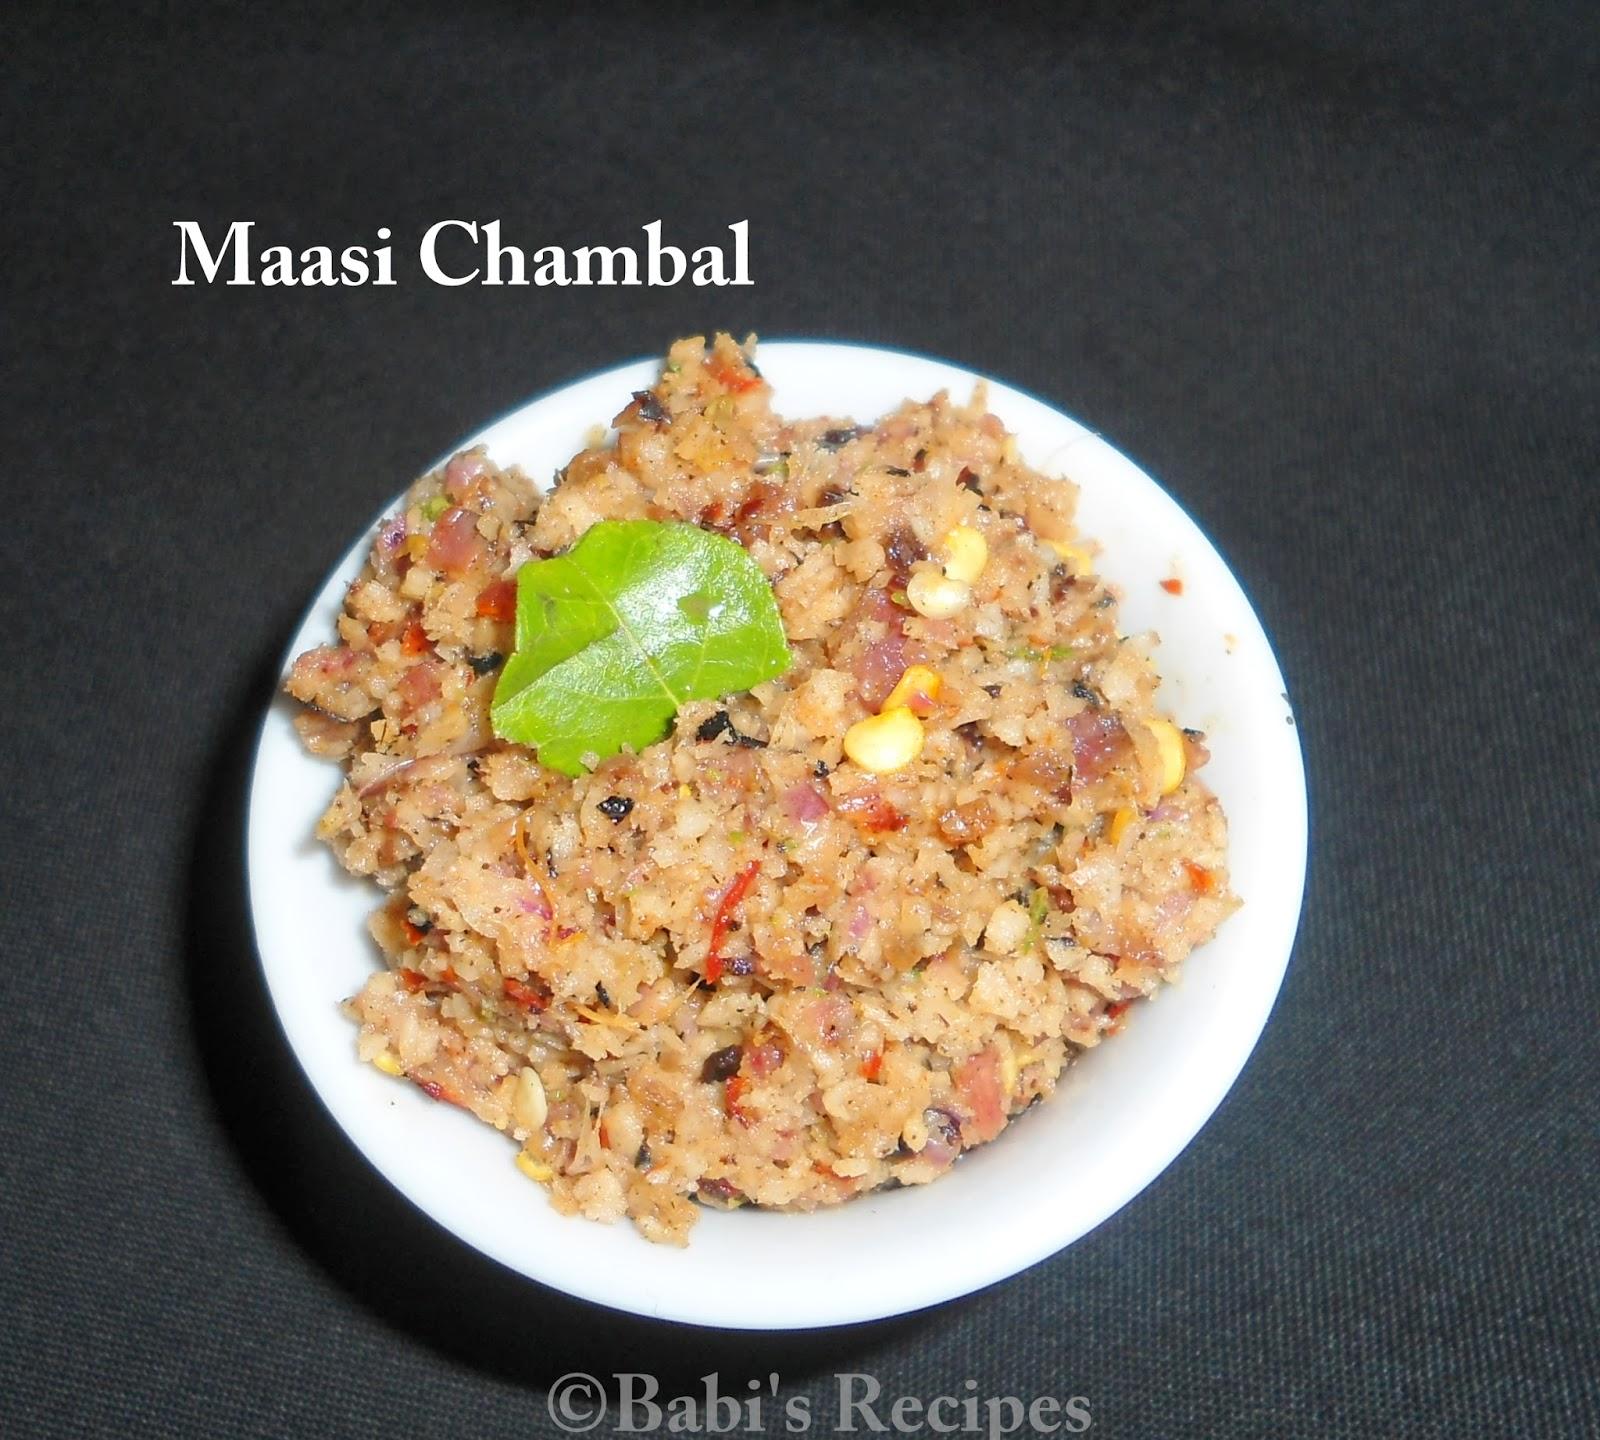 Maasi chambal